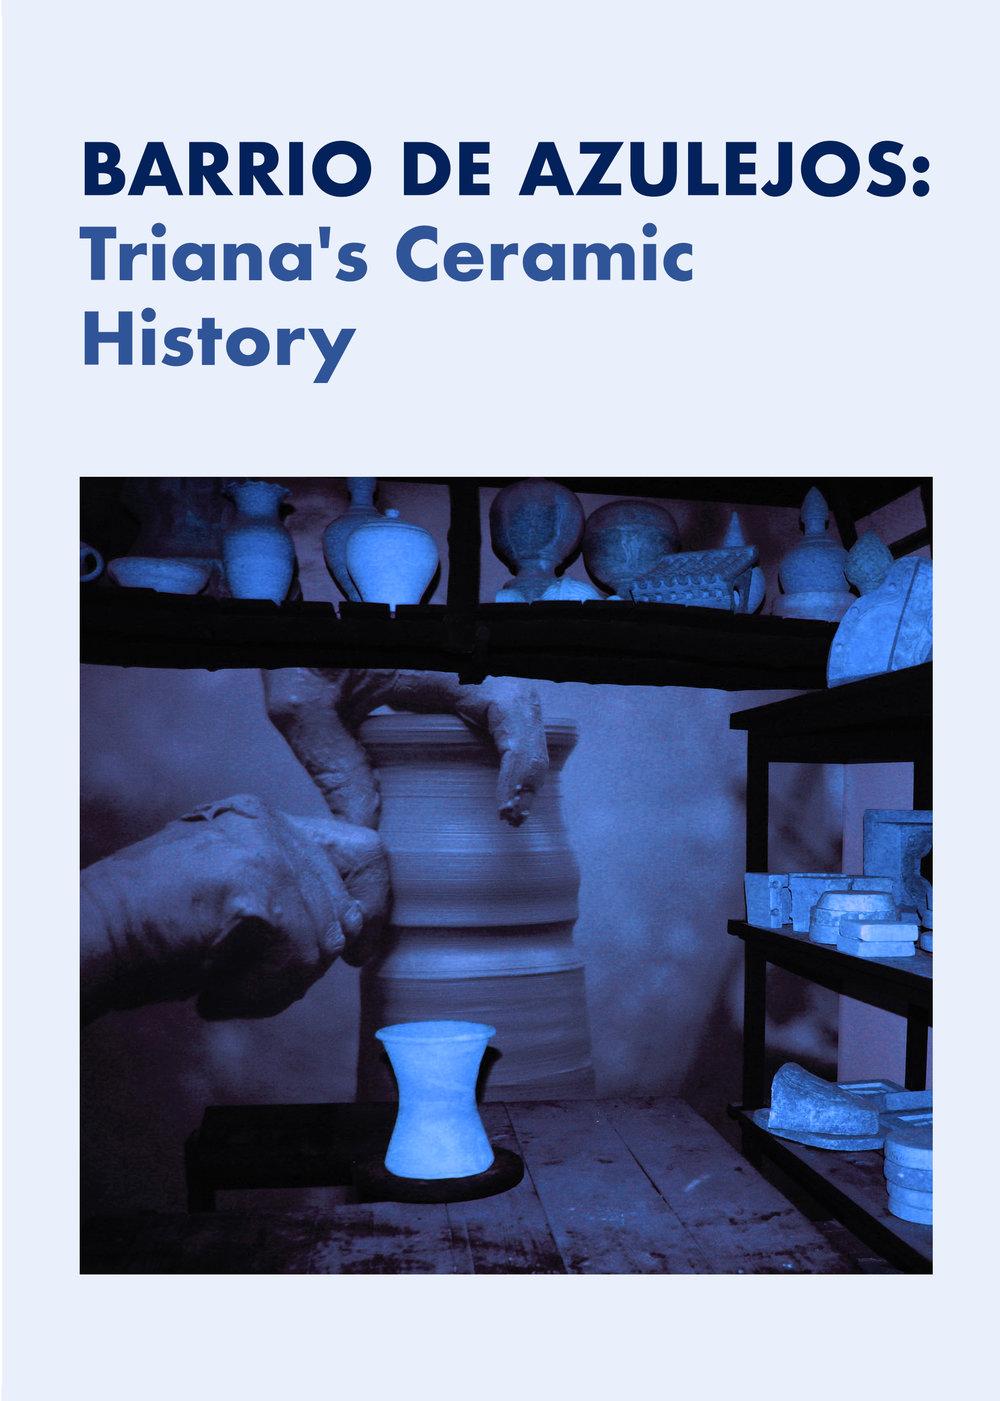 Ceramic history bookfron cover.jpg